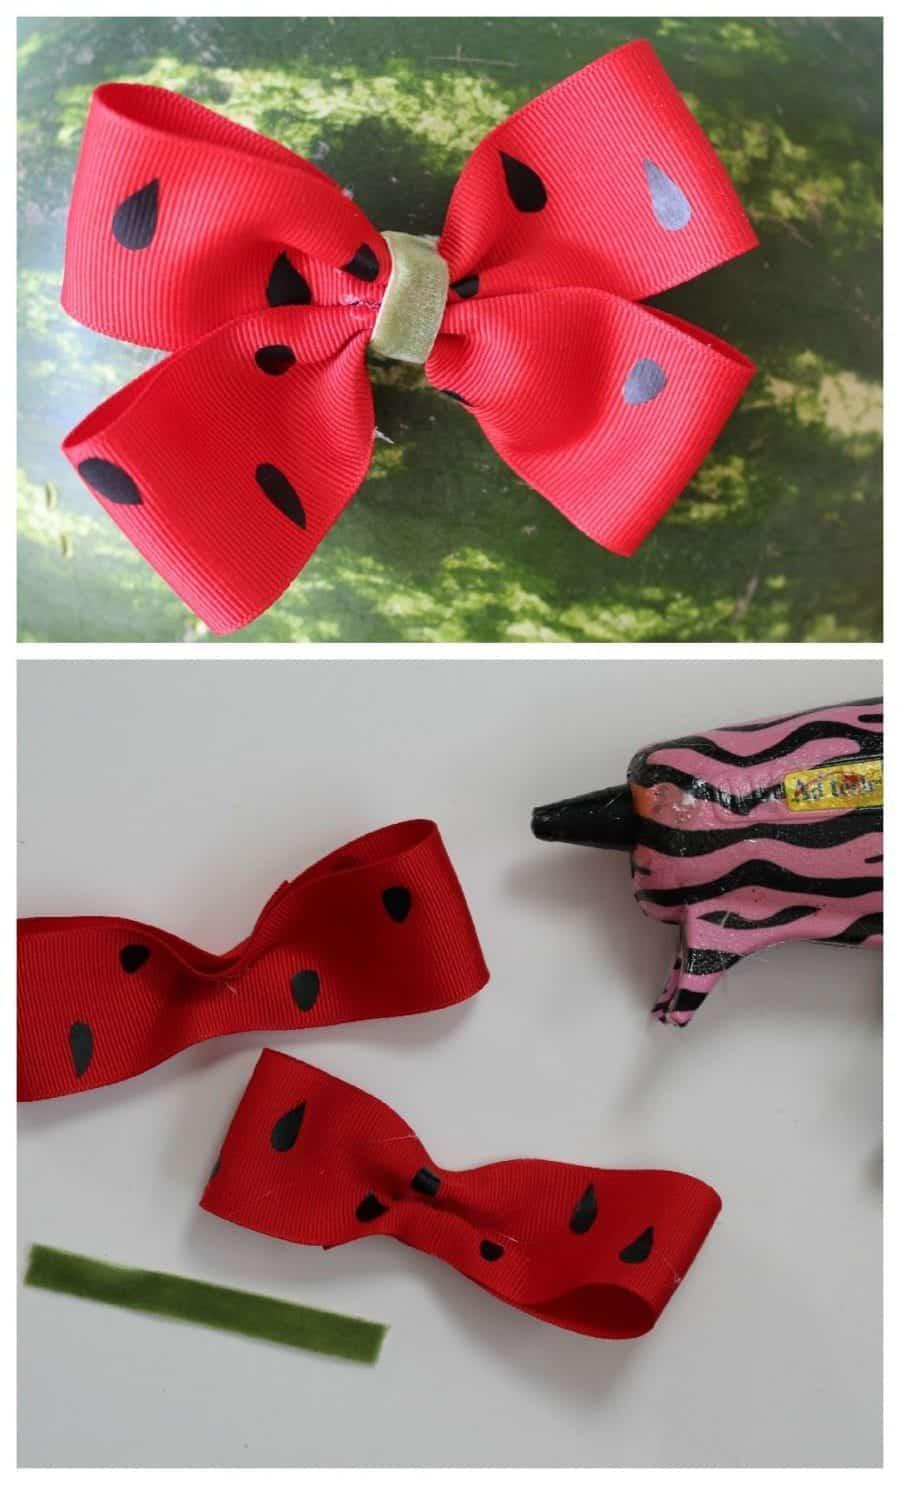 watermelon-headband-for-girls-900x1485